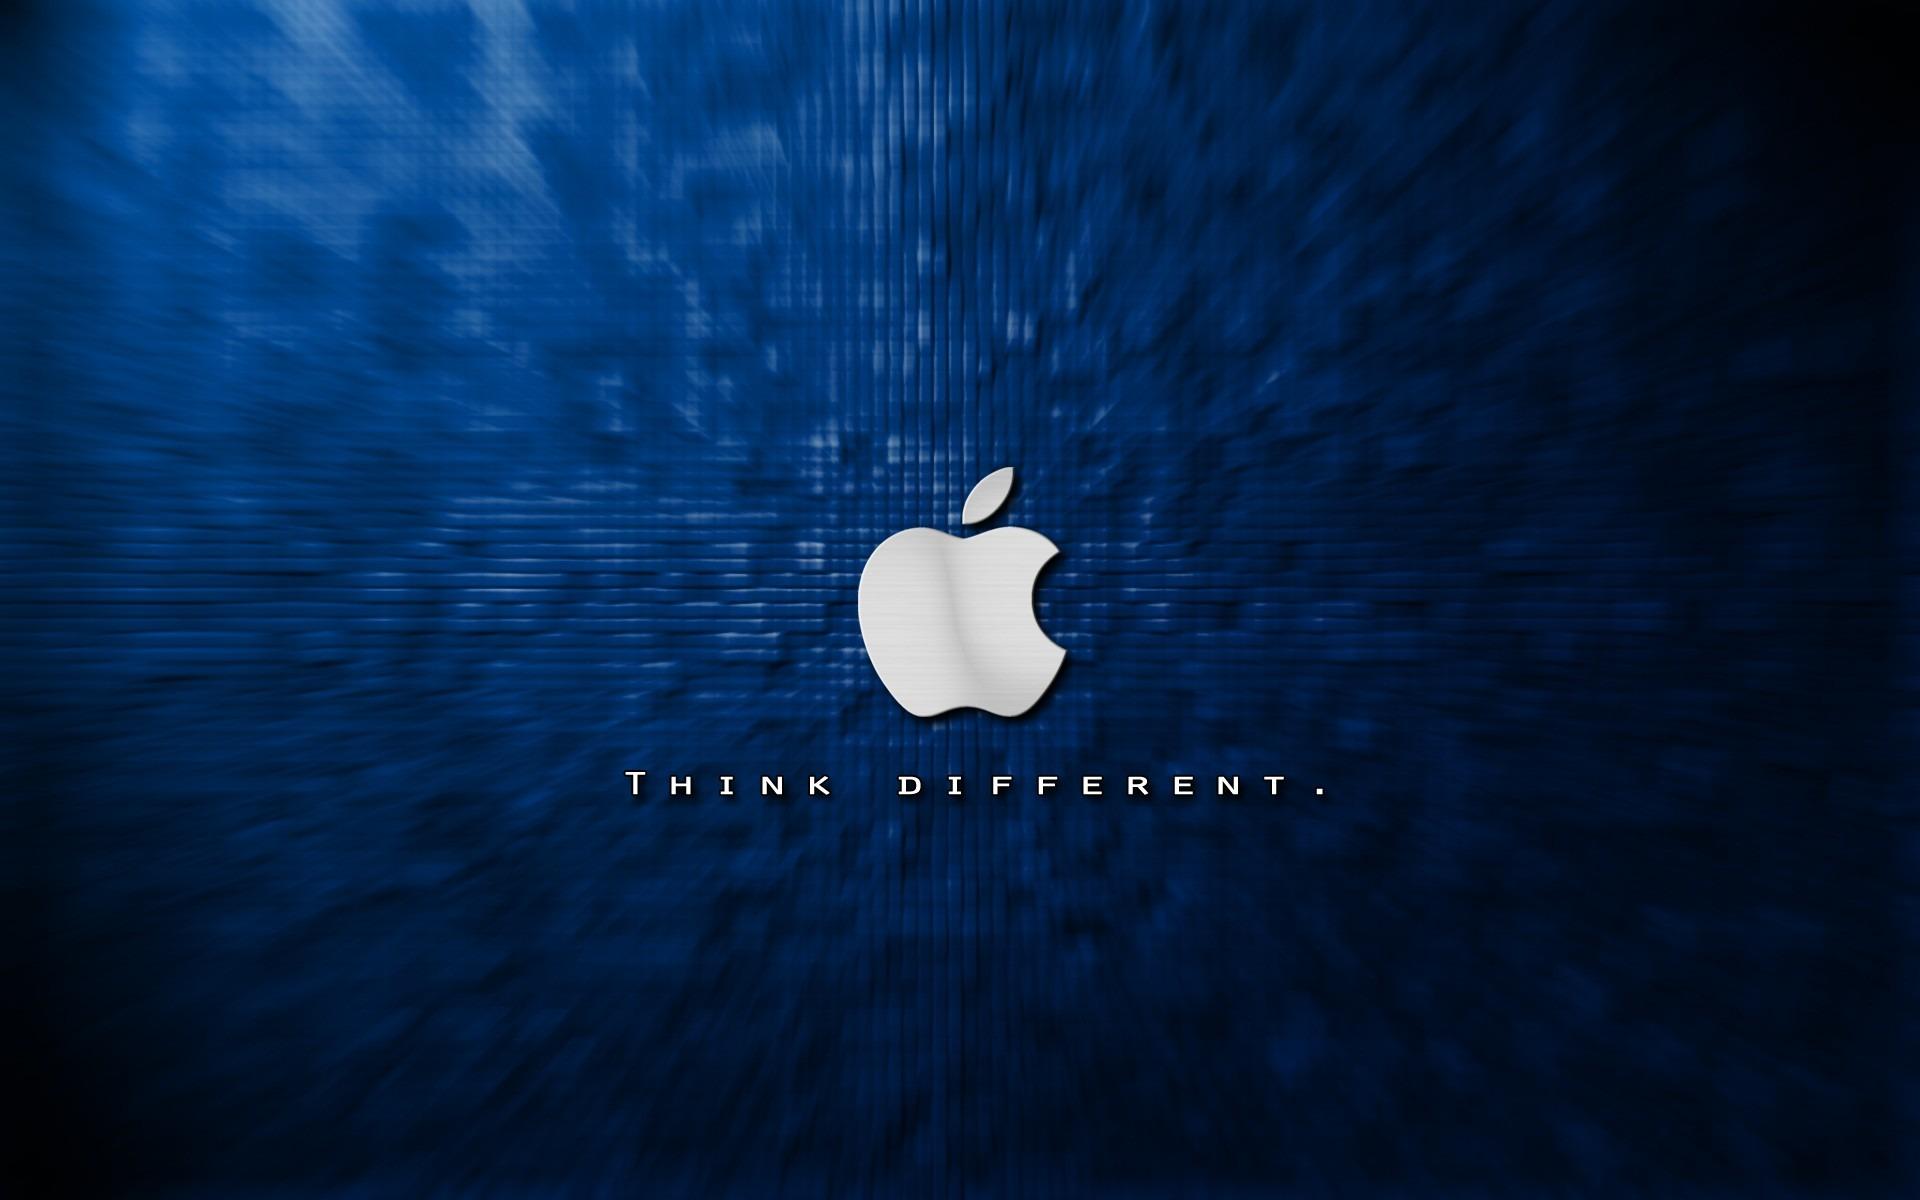 Apple Logo ブランド広告のテーマの壁紙プレビュー 10wallpaper Com